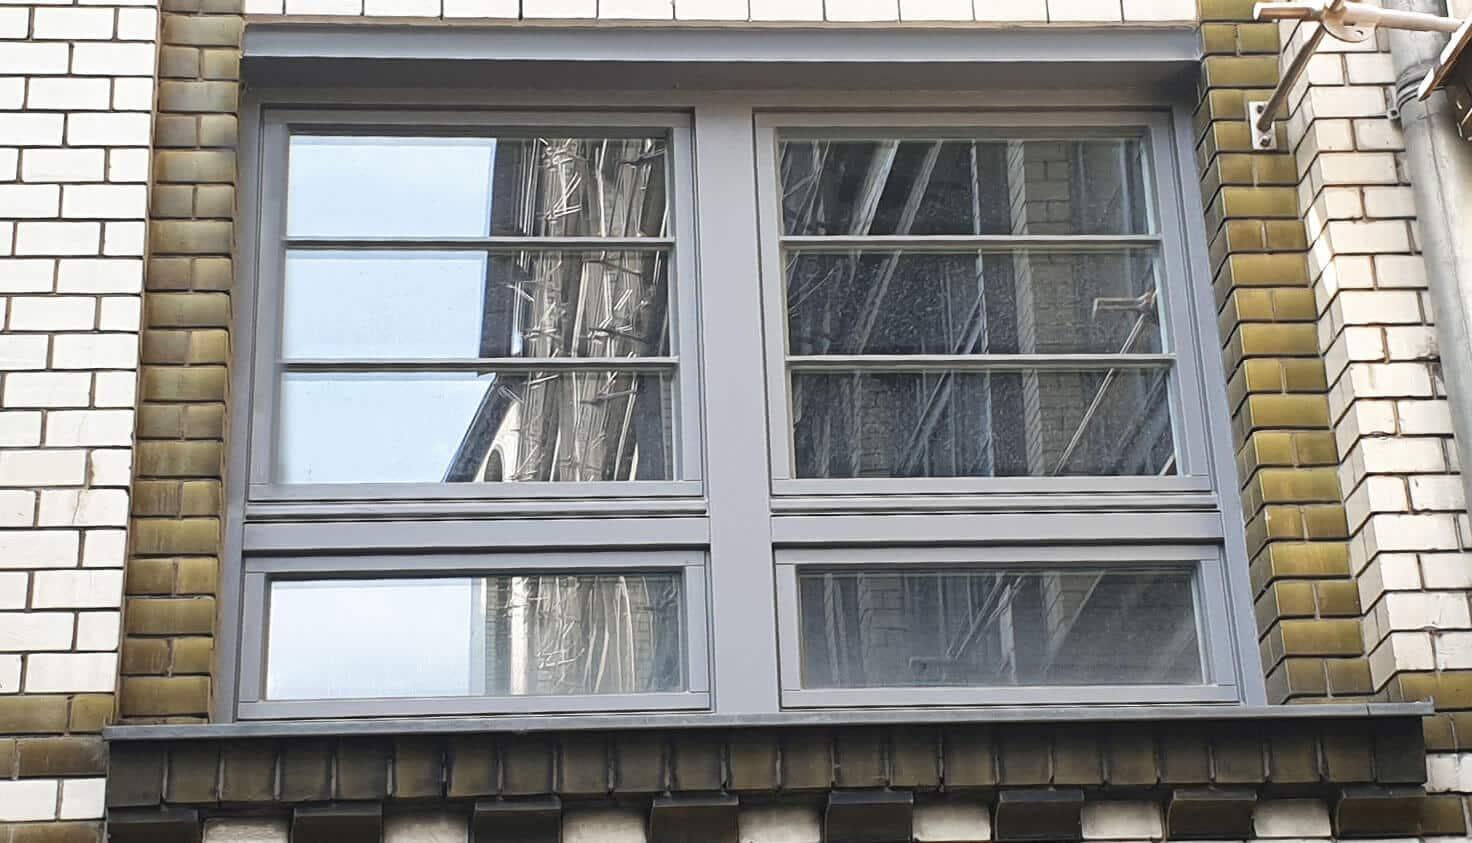 06-Fassade-referenz-malerbetrieb-kluge-berlin